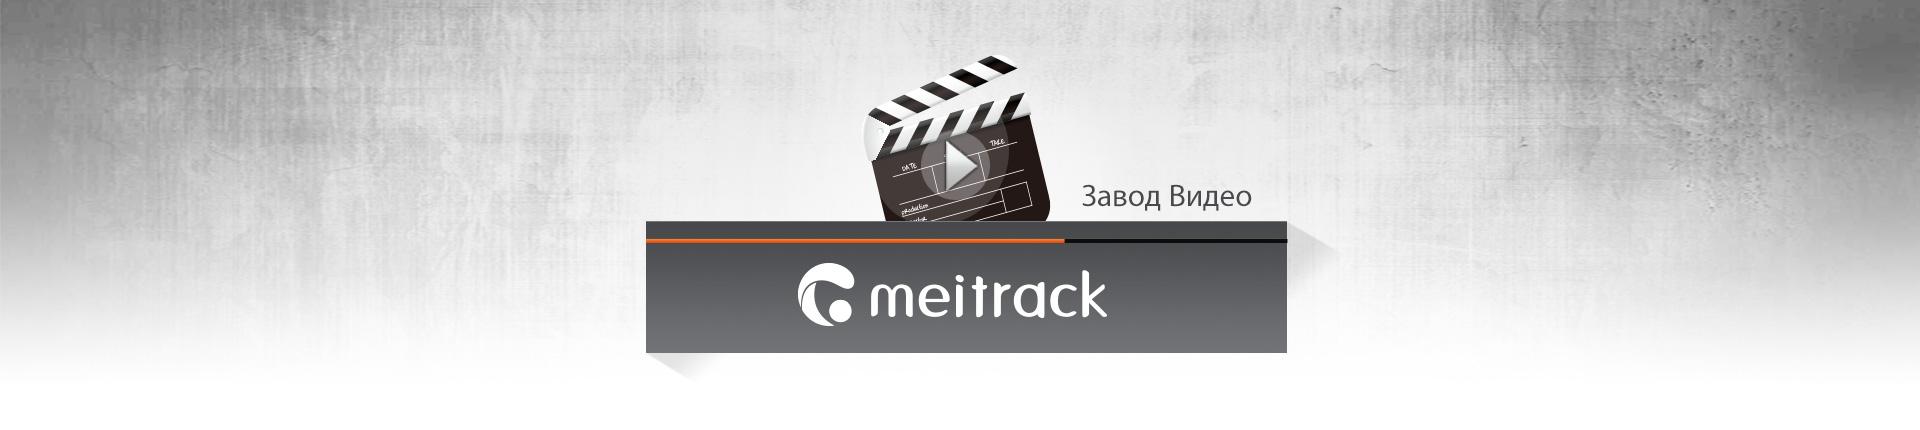 Factory-Video.eguojpg